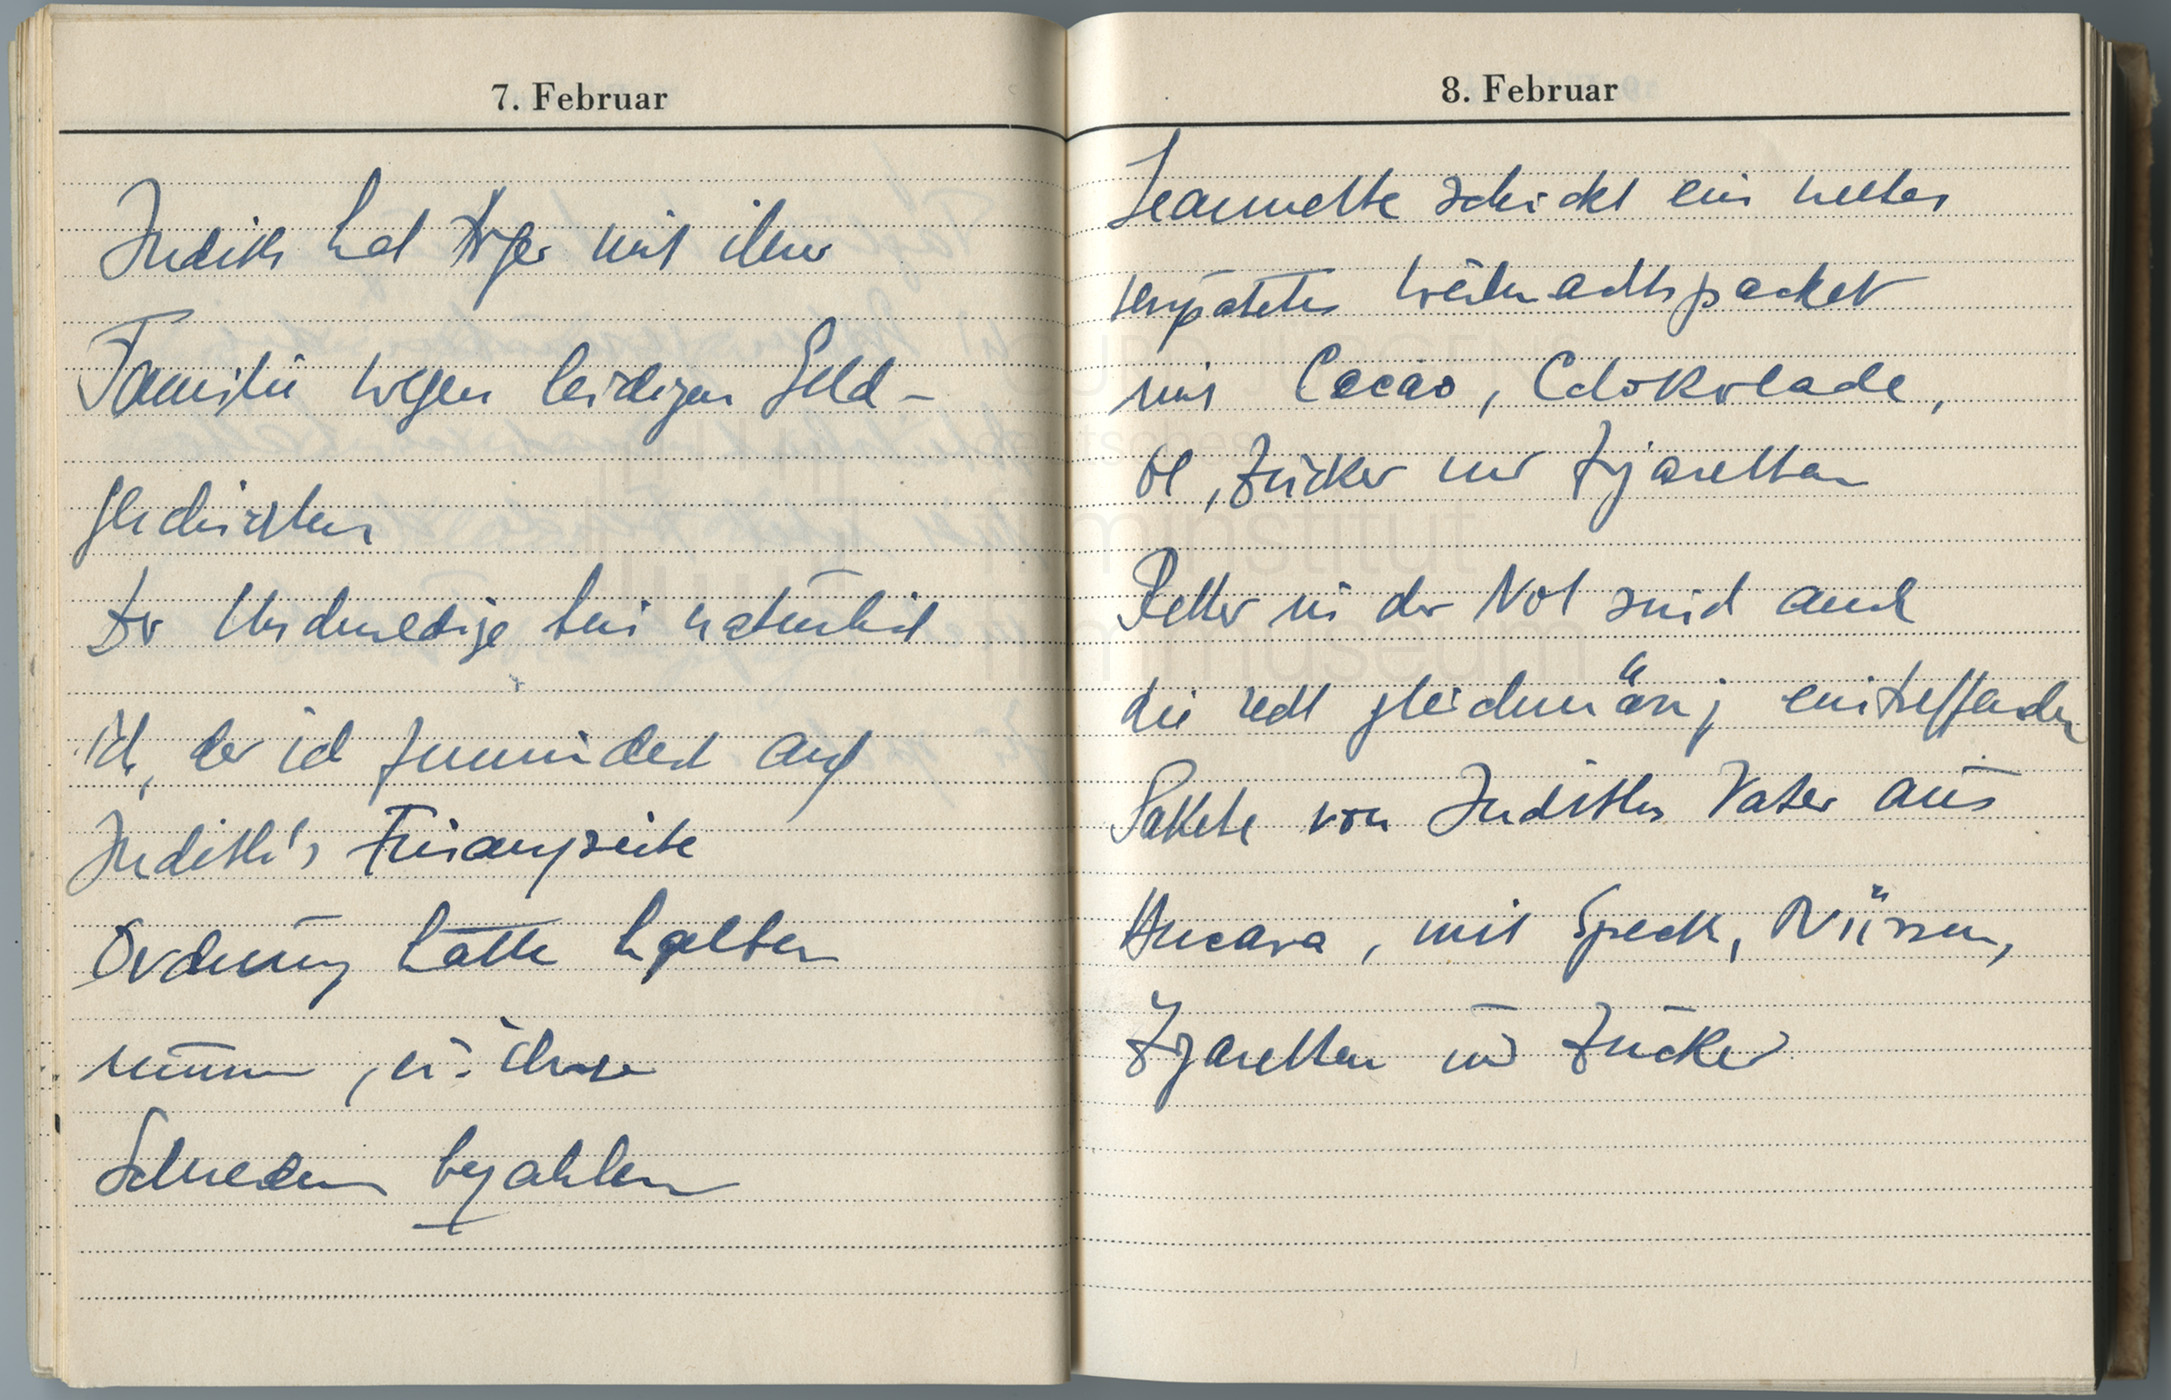 Tagebucheintrag vom 8.2.1947